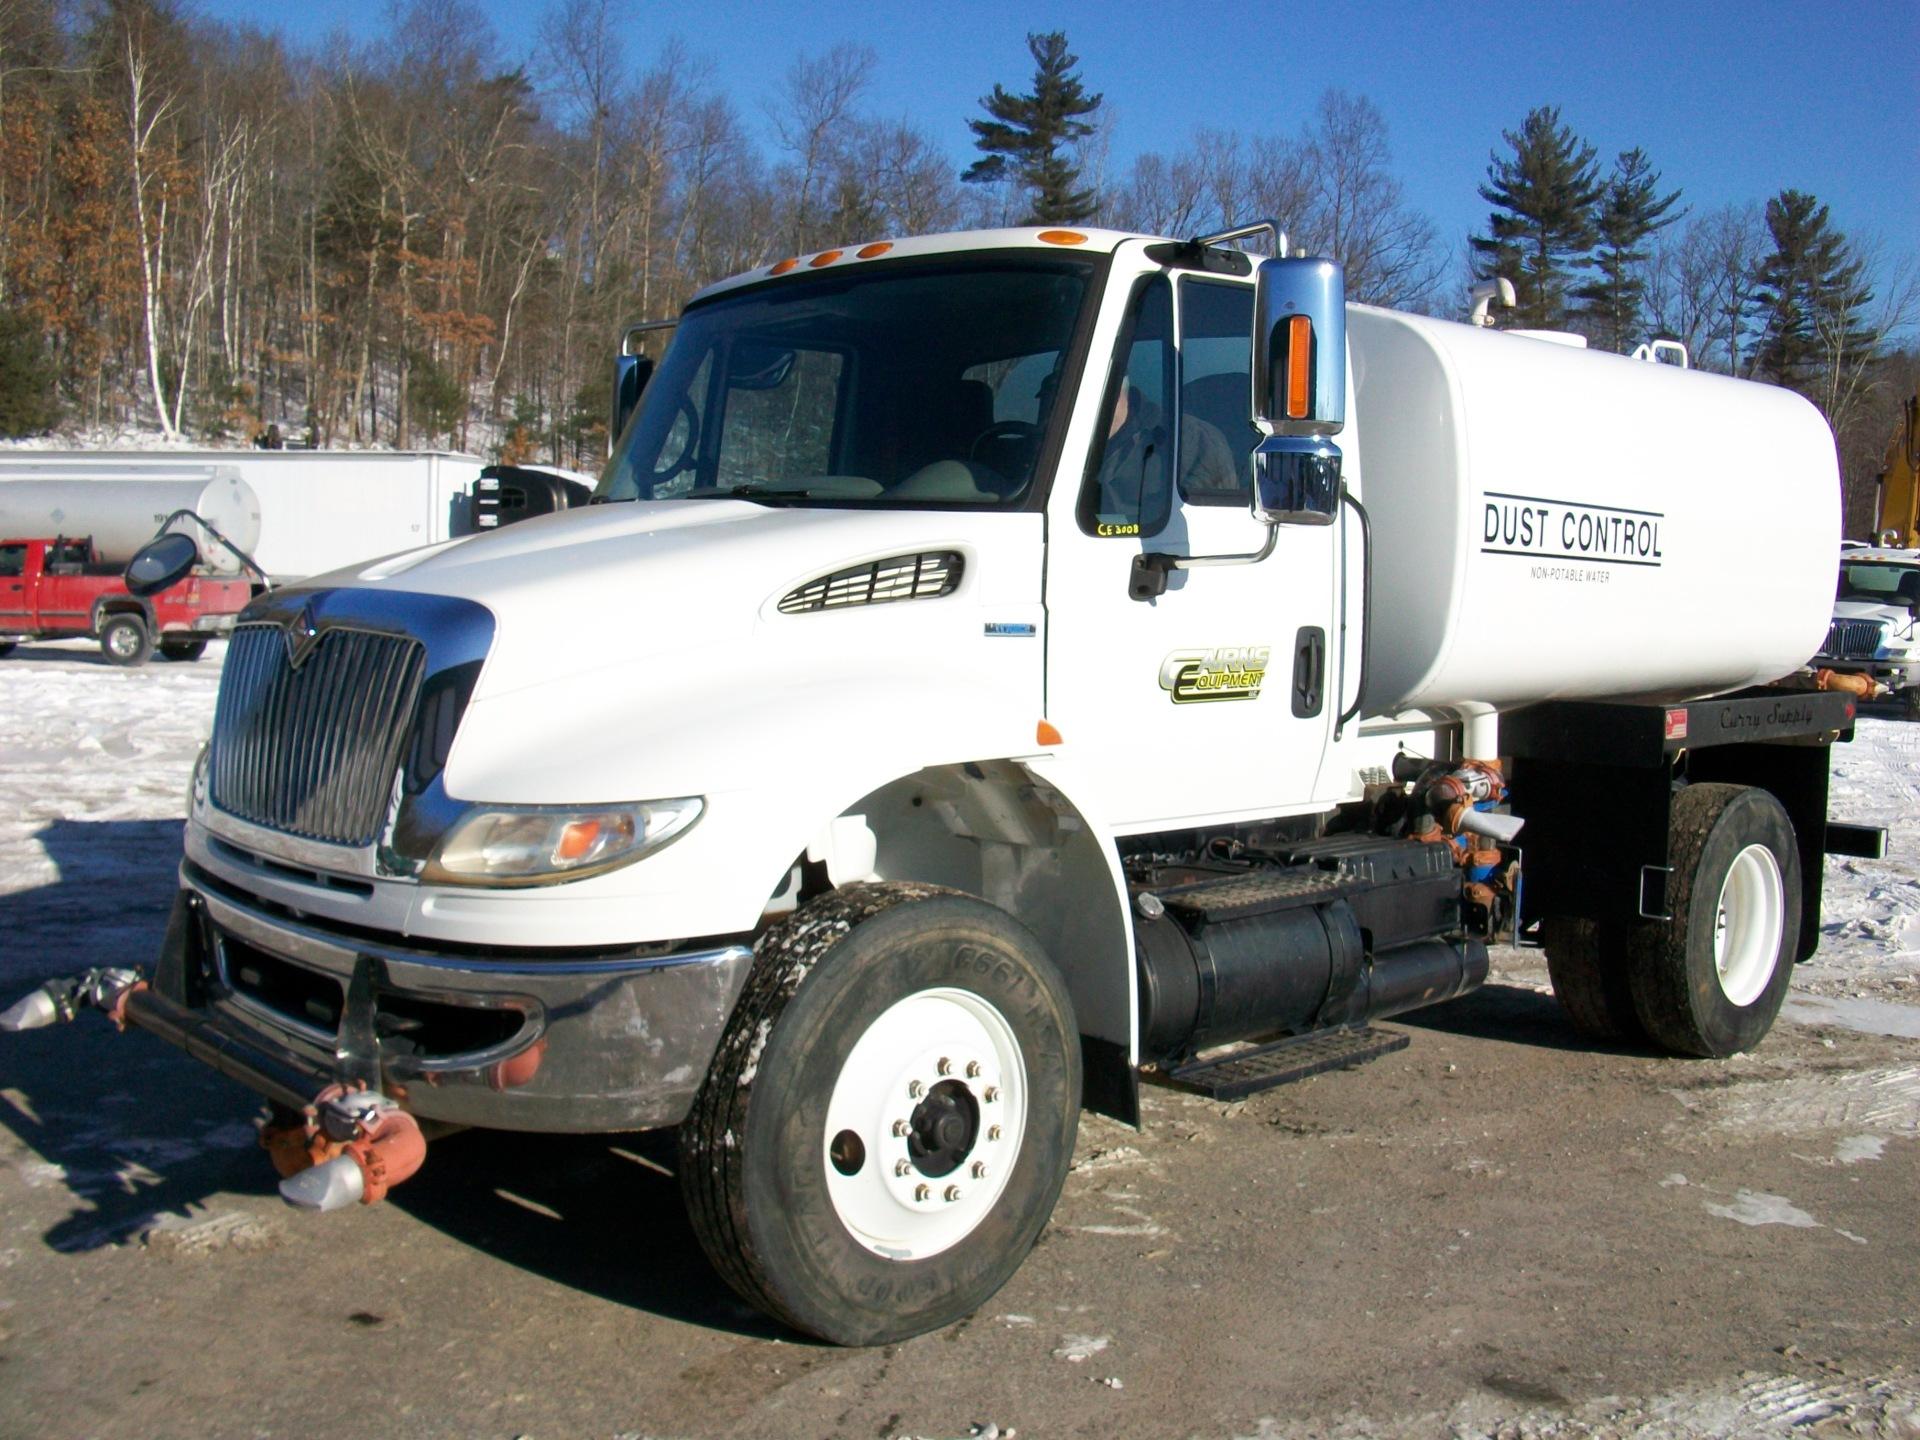 2009 International 4400 water truck, $38,500